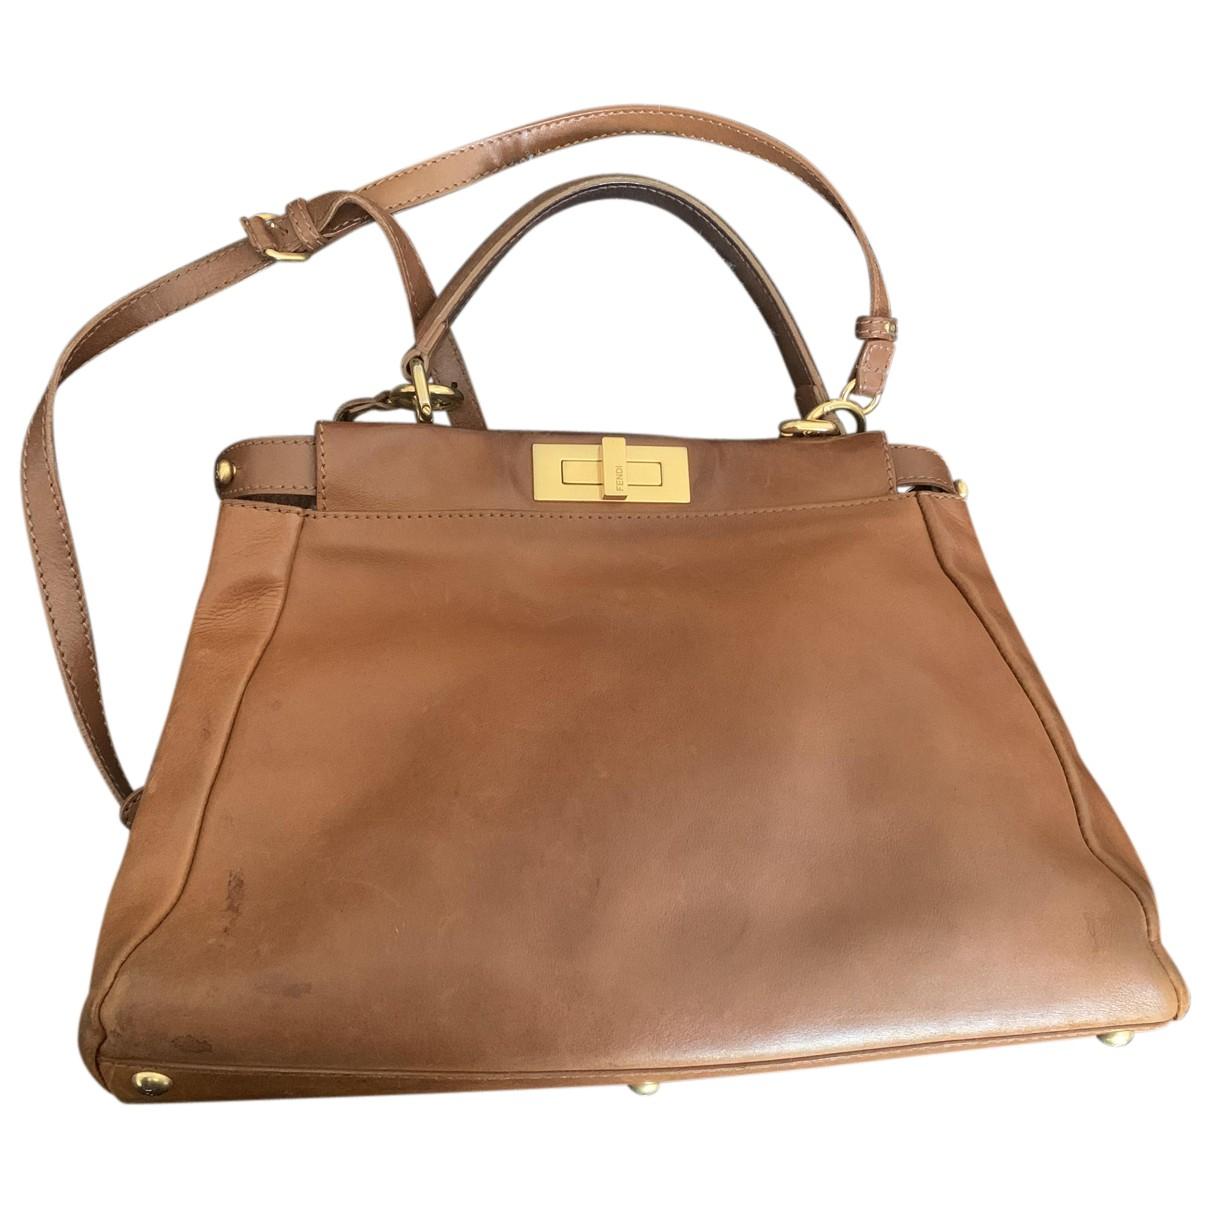 Fendi Peekaboo Camel Leather handbag for Women N